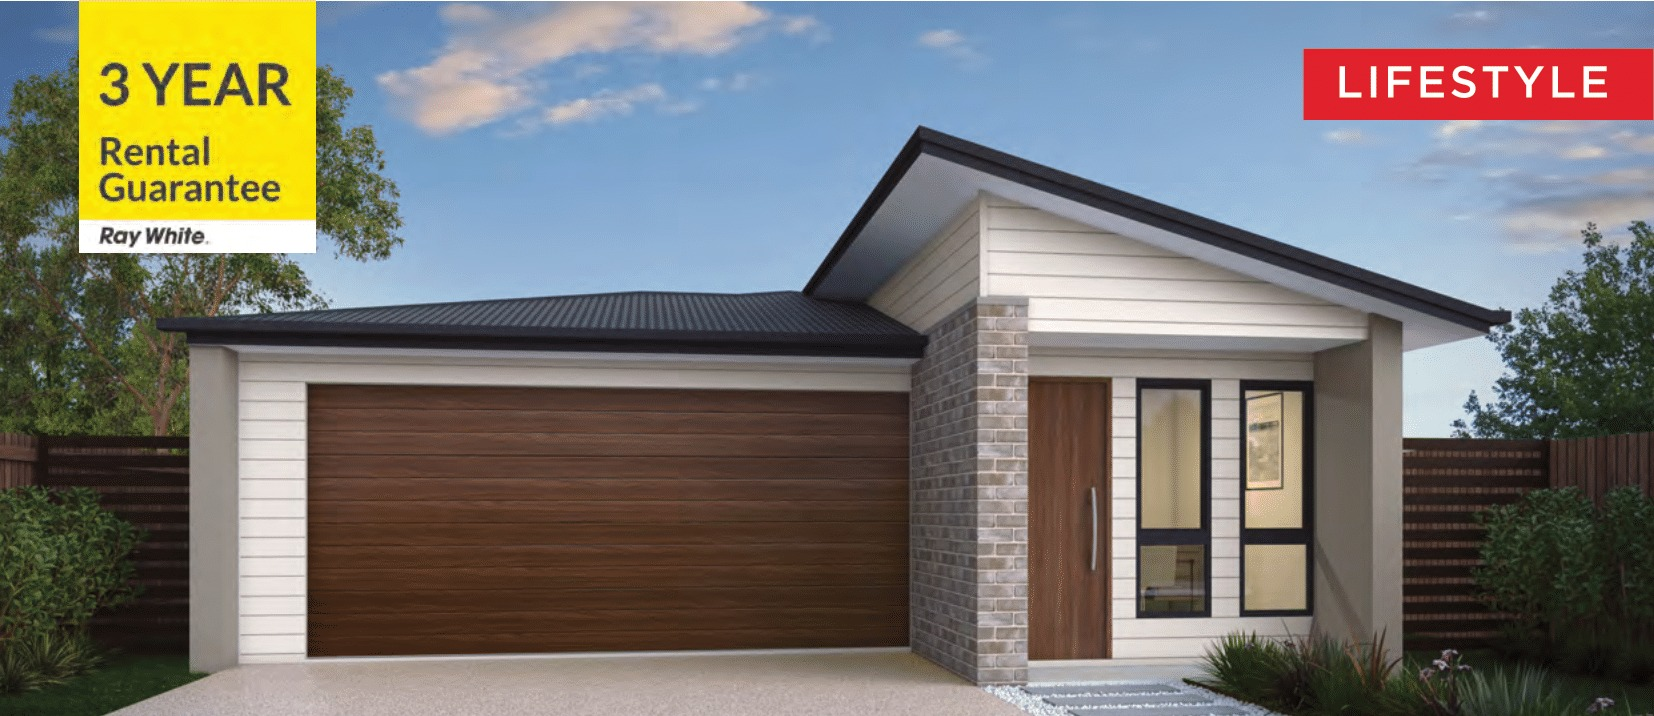 Lot 37, 16 Farmer Place The Essence, Park Ridge Logan QLD 4125